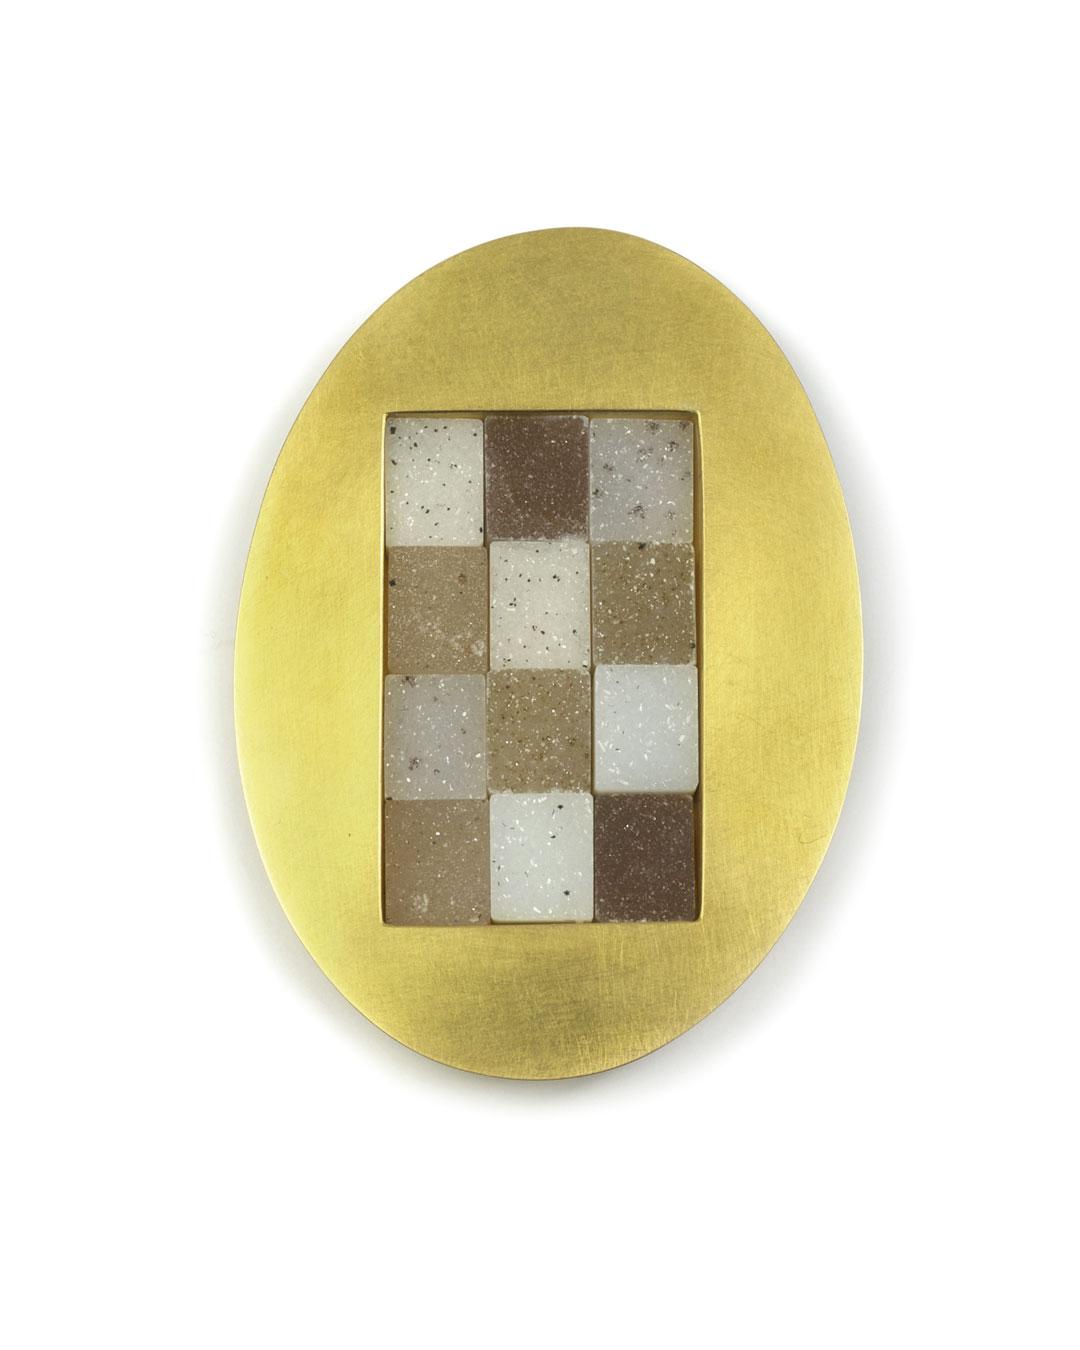 Etsuko Sonobe, untitled, 2008, brooch; 20ct gold, agate, 48 x 67 x 8 mm, €4800